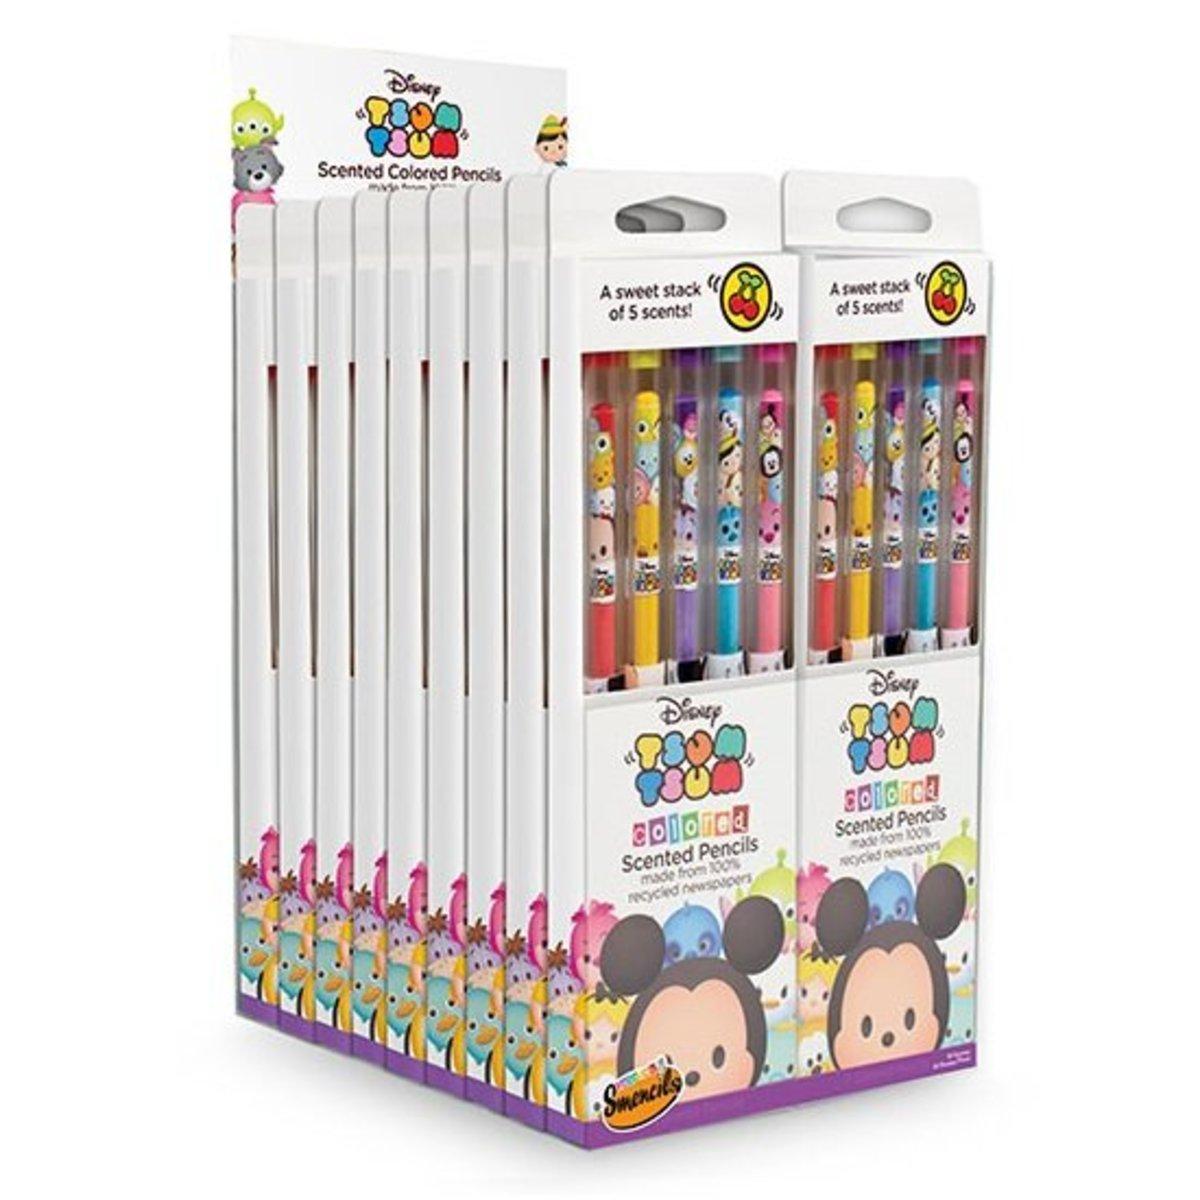 TSUM TSUM Coloured Pencil ((20 packs of 5-unit pack)) Smencils DT4006x20